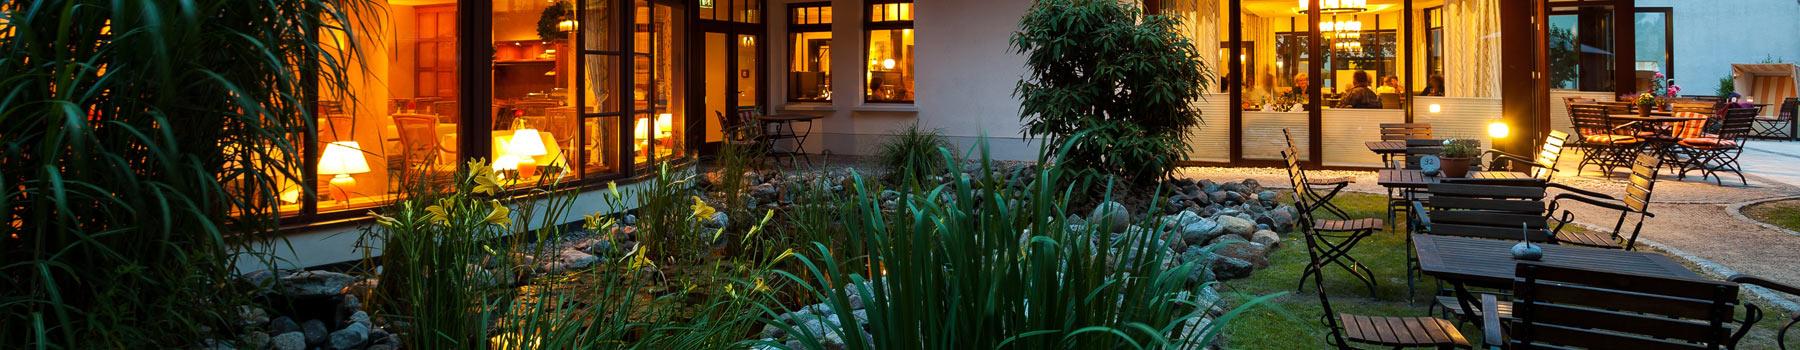 Service schmal - Hotel Warnemünder Hof